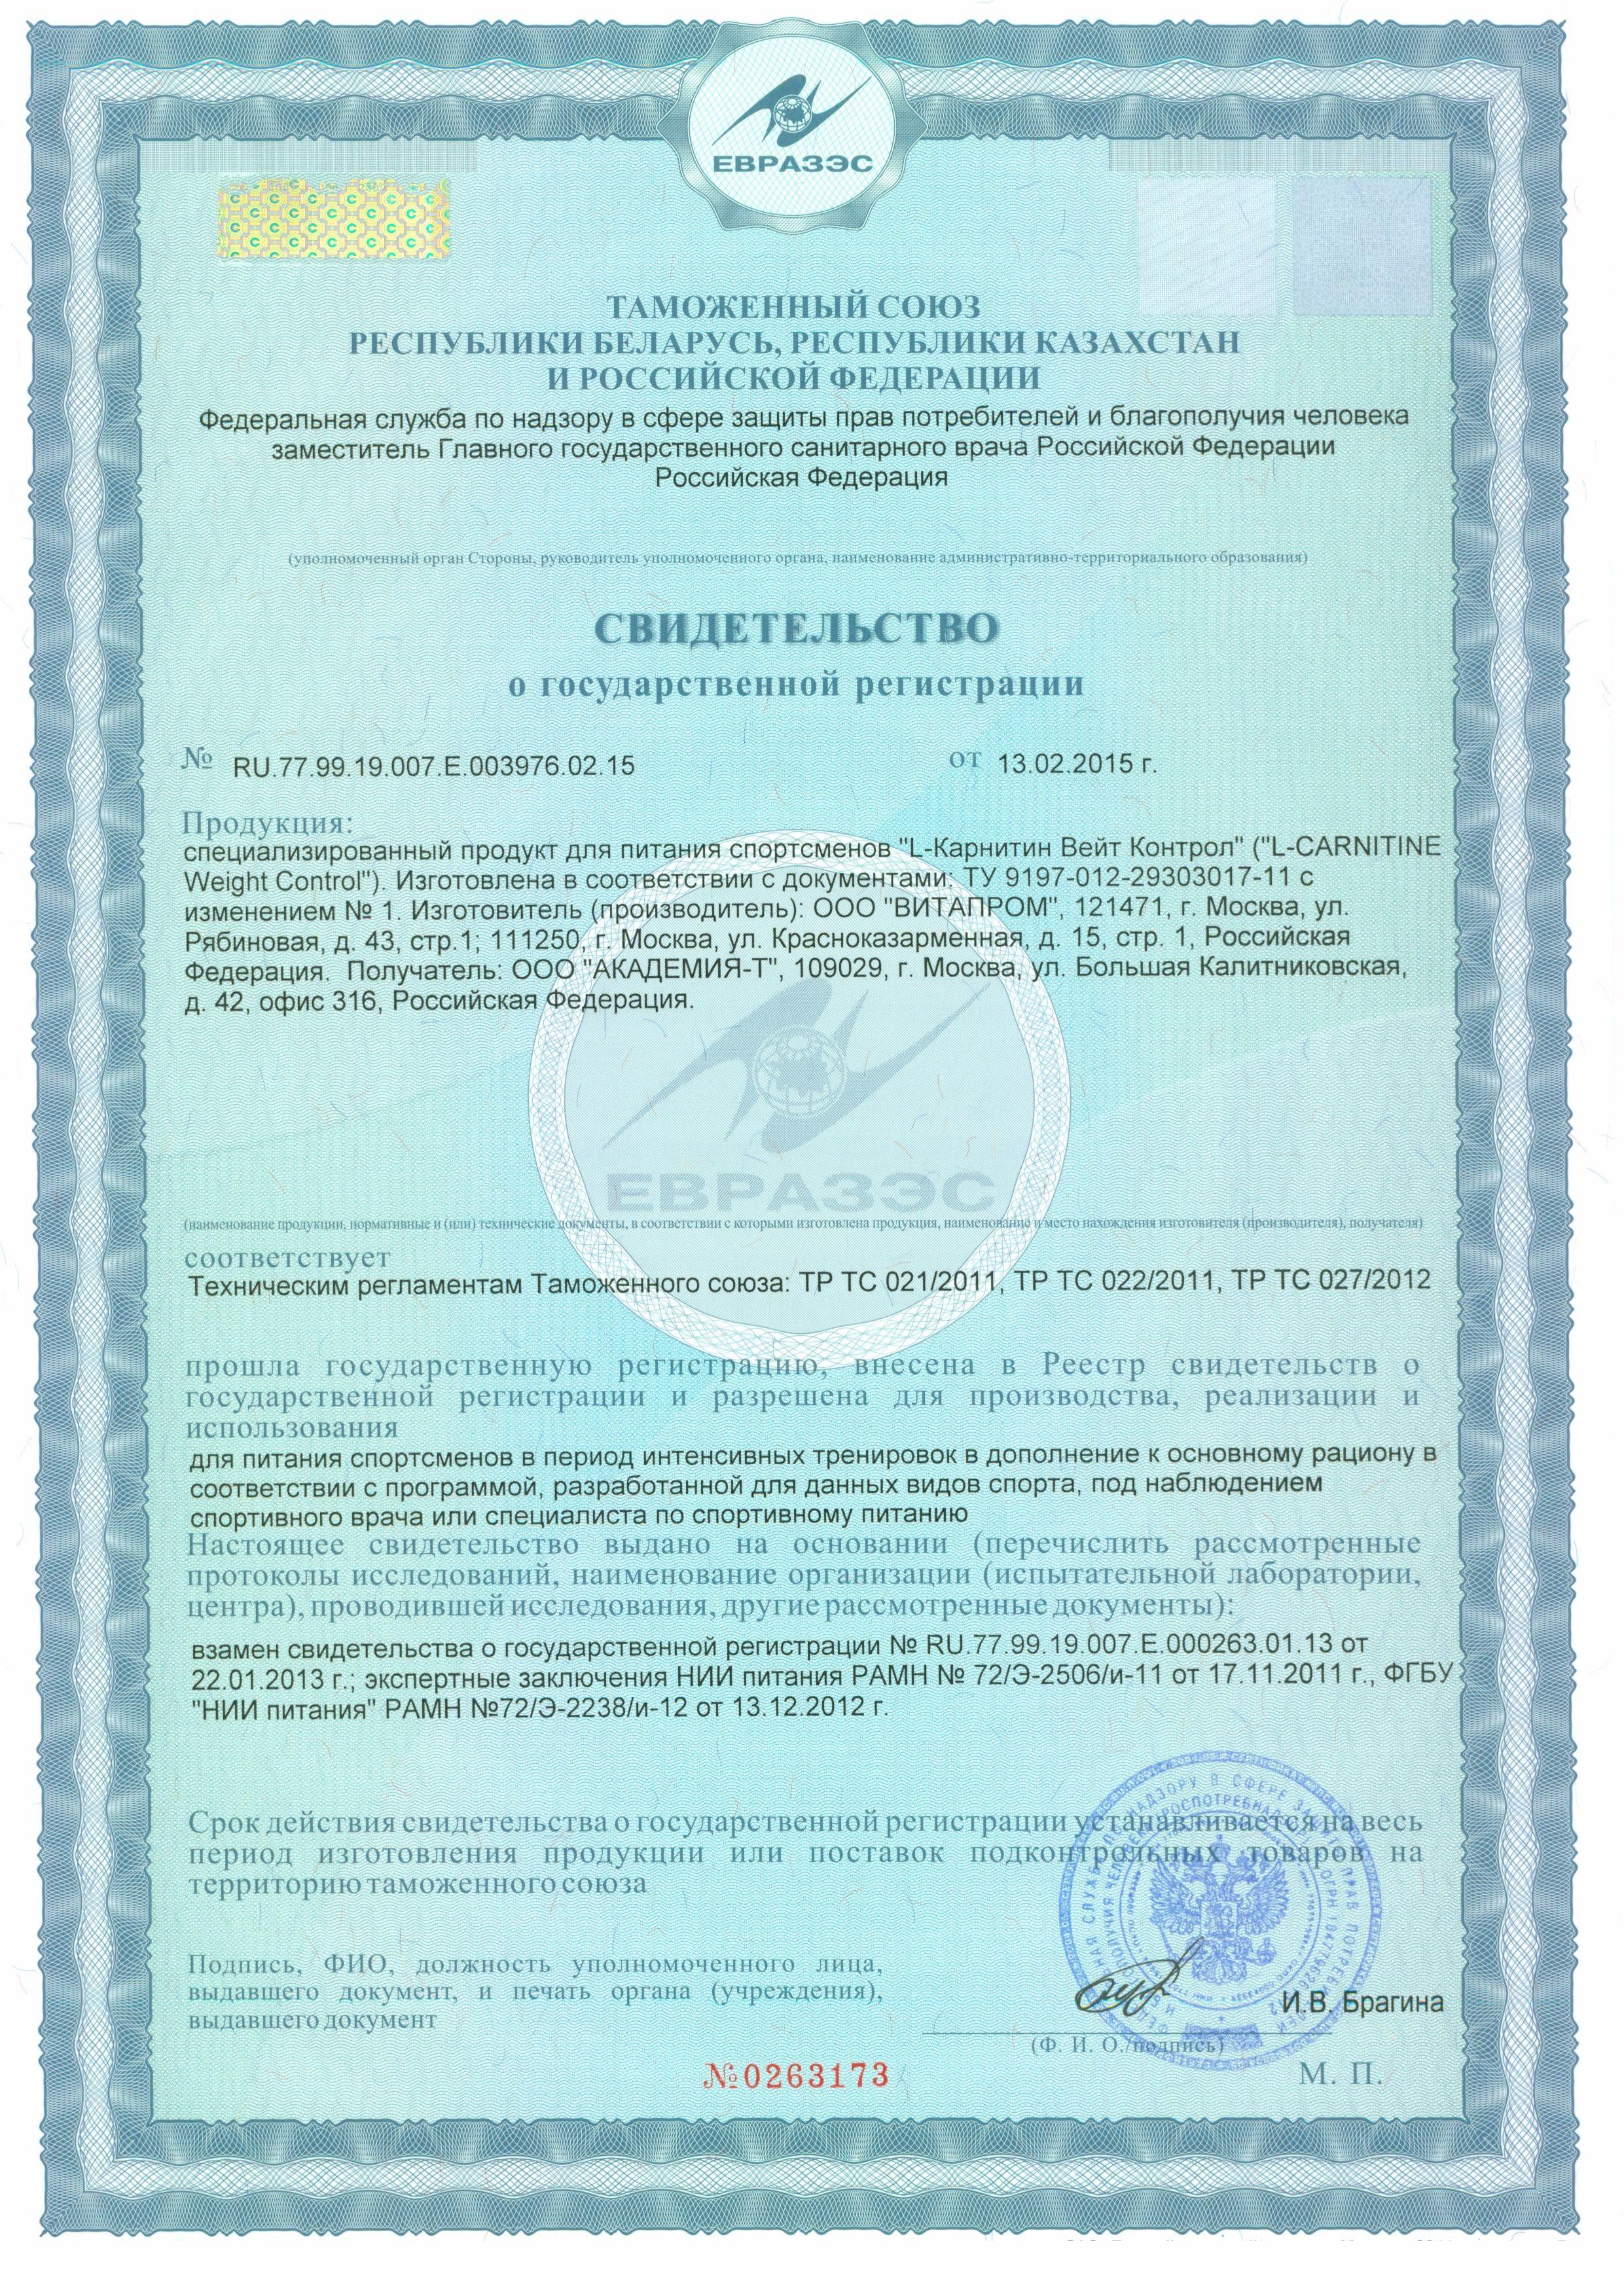 Сертификат L-CARNITINE Weight Control